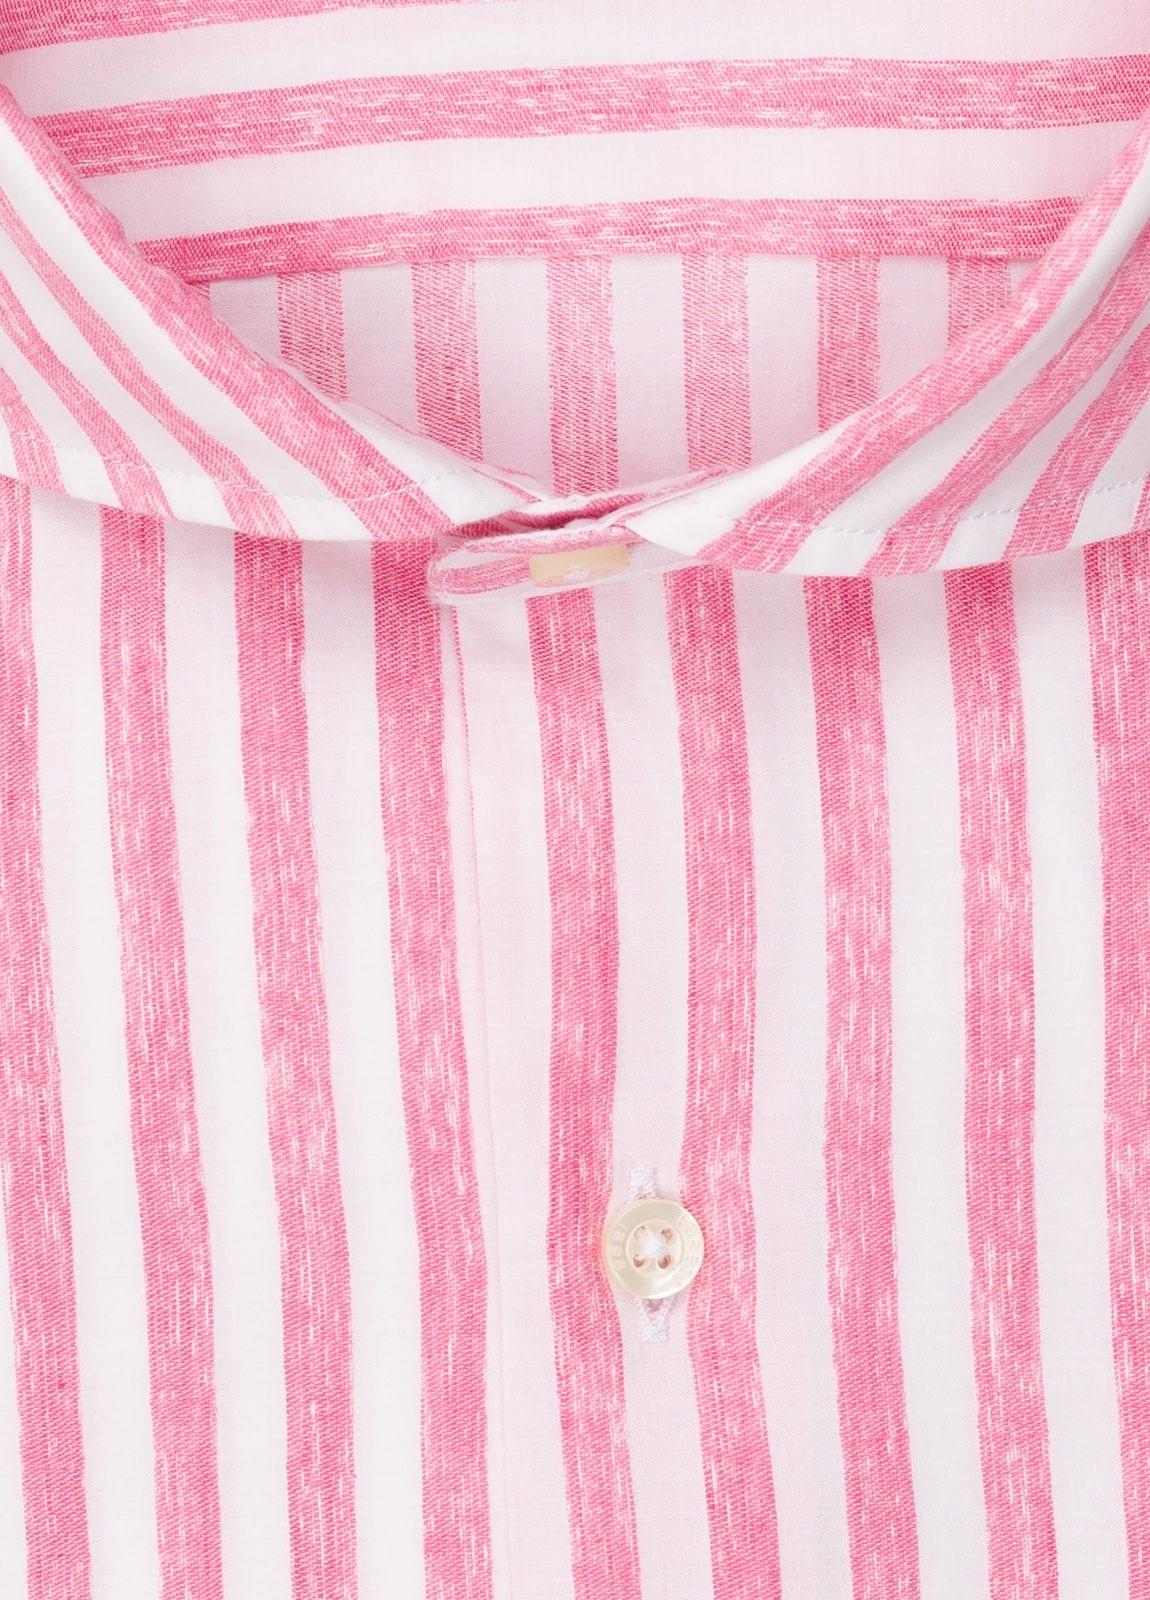 Camisa sport FUREST COLECCIÓN slim fit rayas rosa - Ítem1